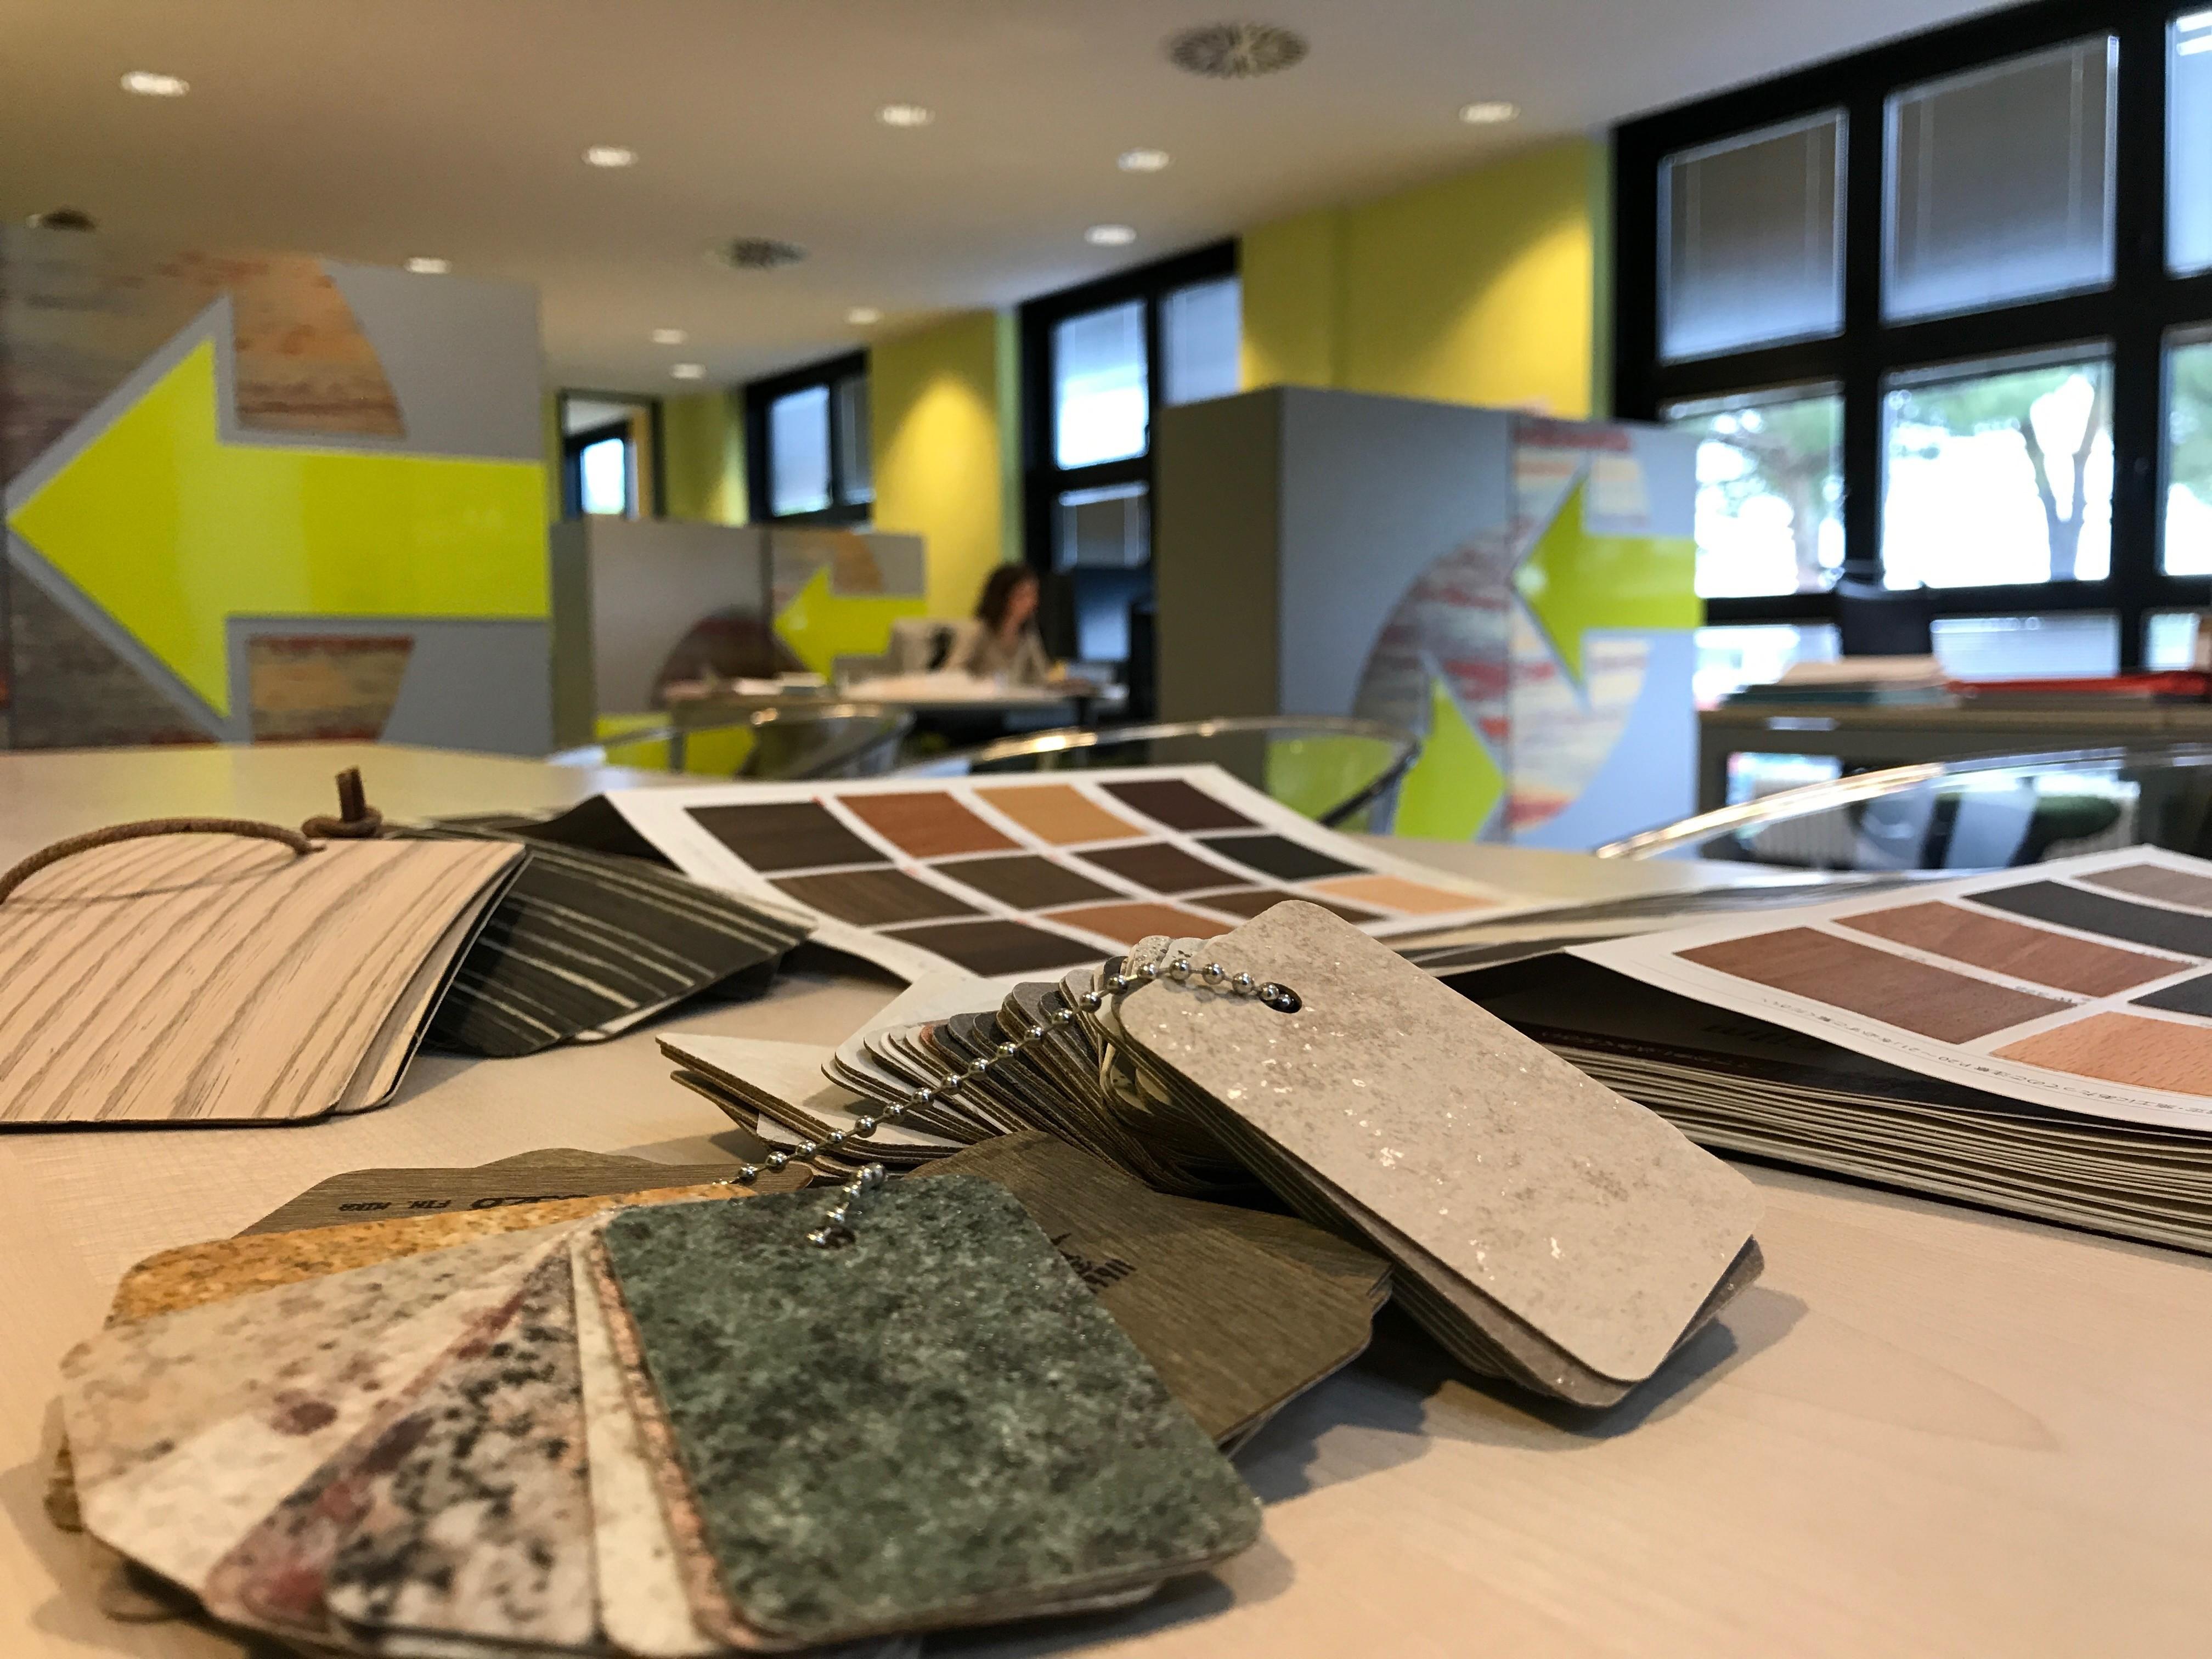 Arredamento Emilia Romagna nilma group | linkedin